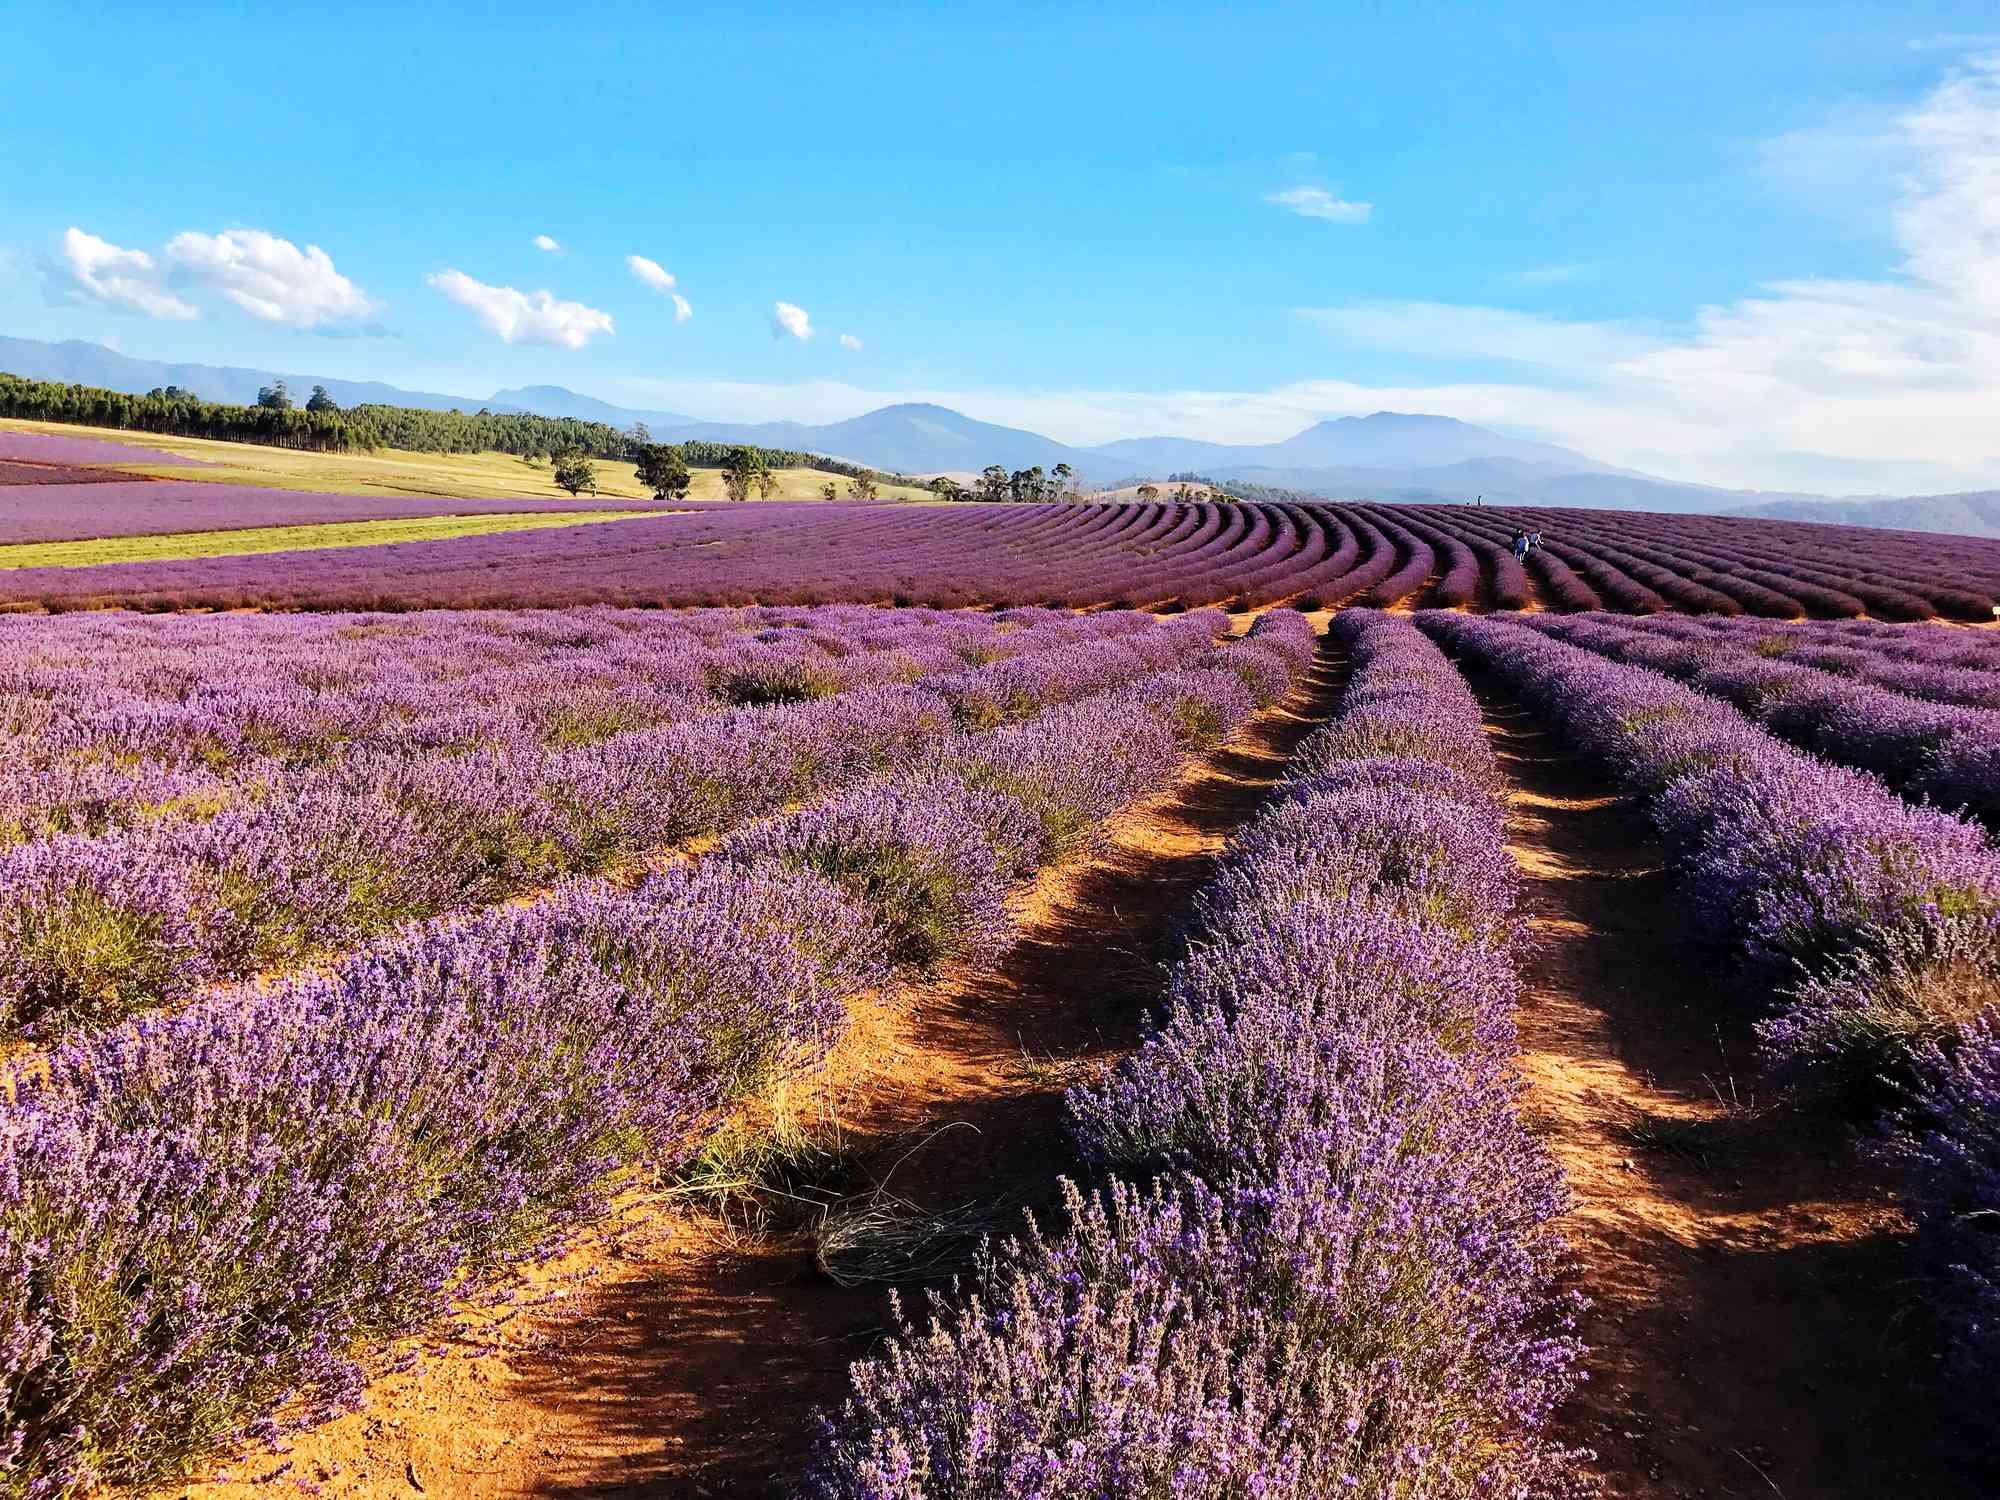 Lavender fields under blue sky